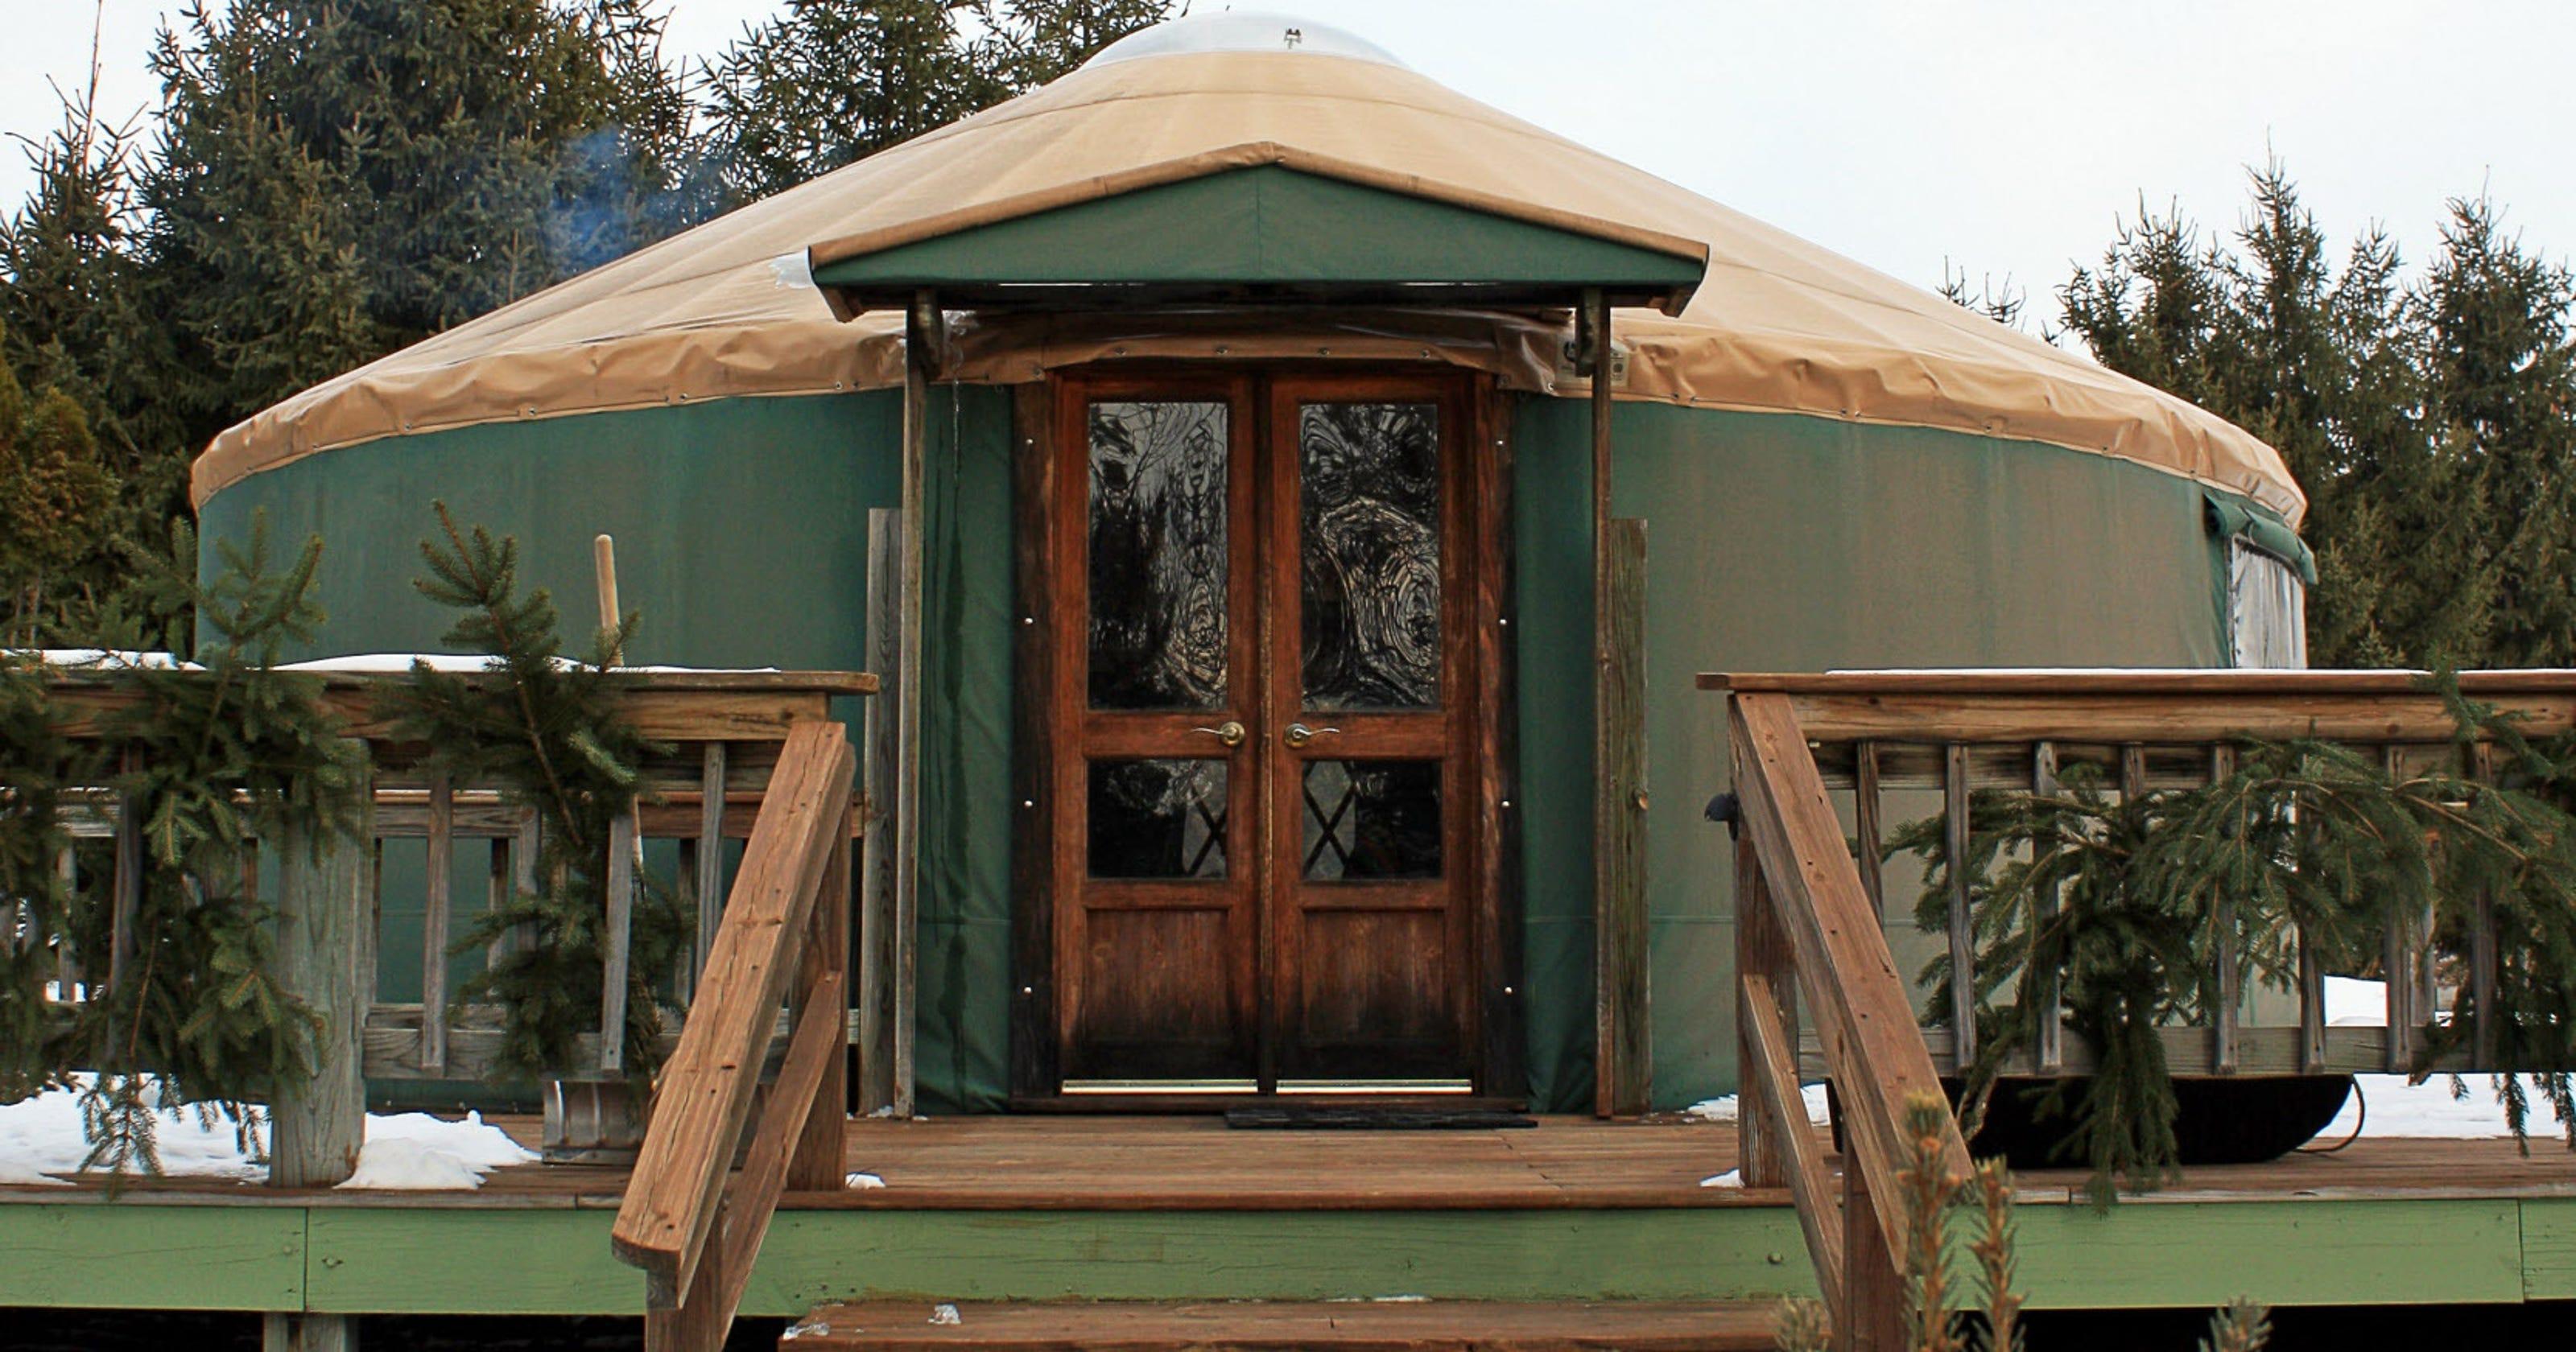 Yurt at Namekagon Waters Retreat is a 'glamping' getaway